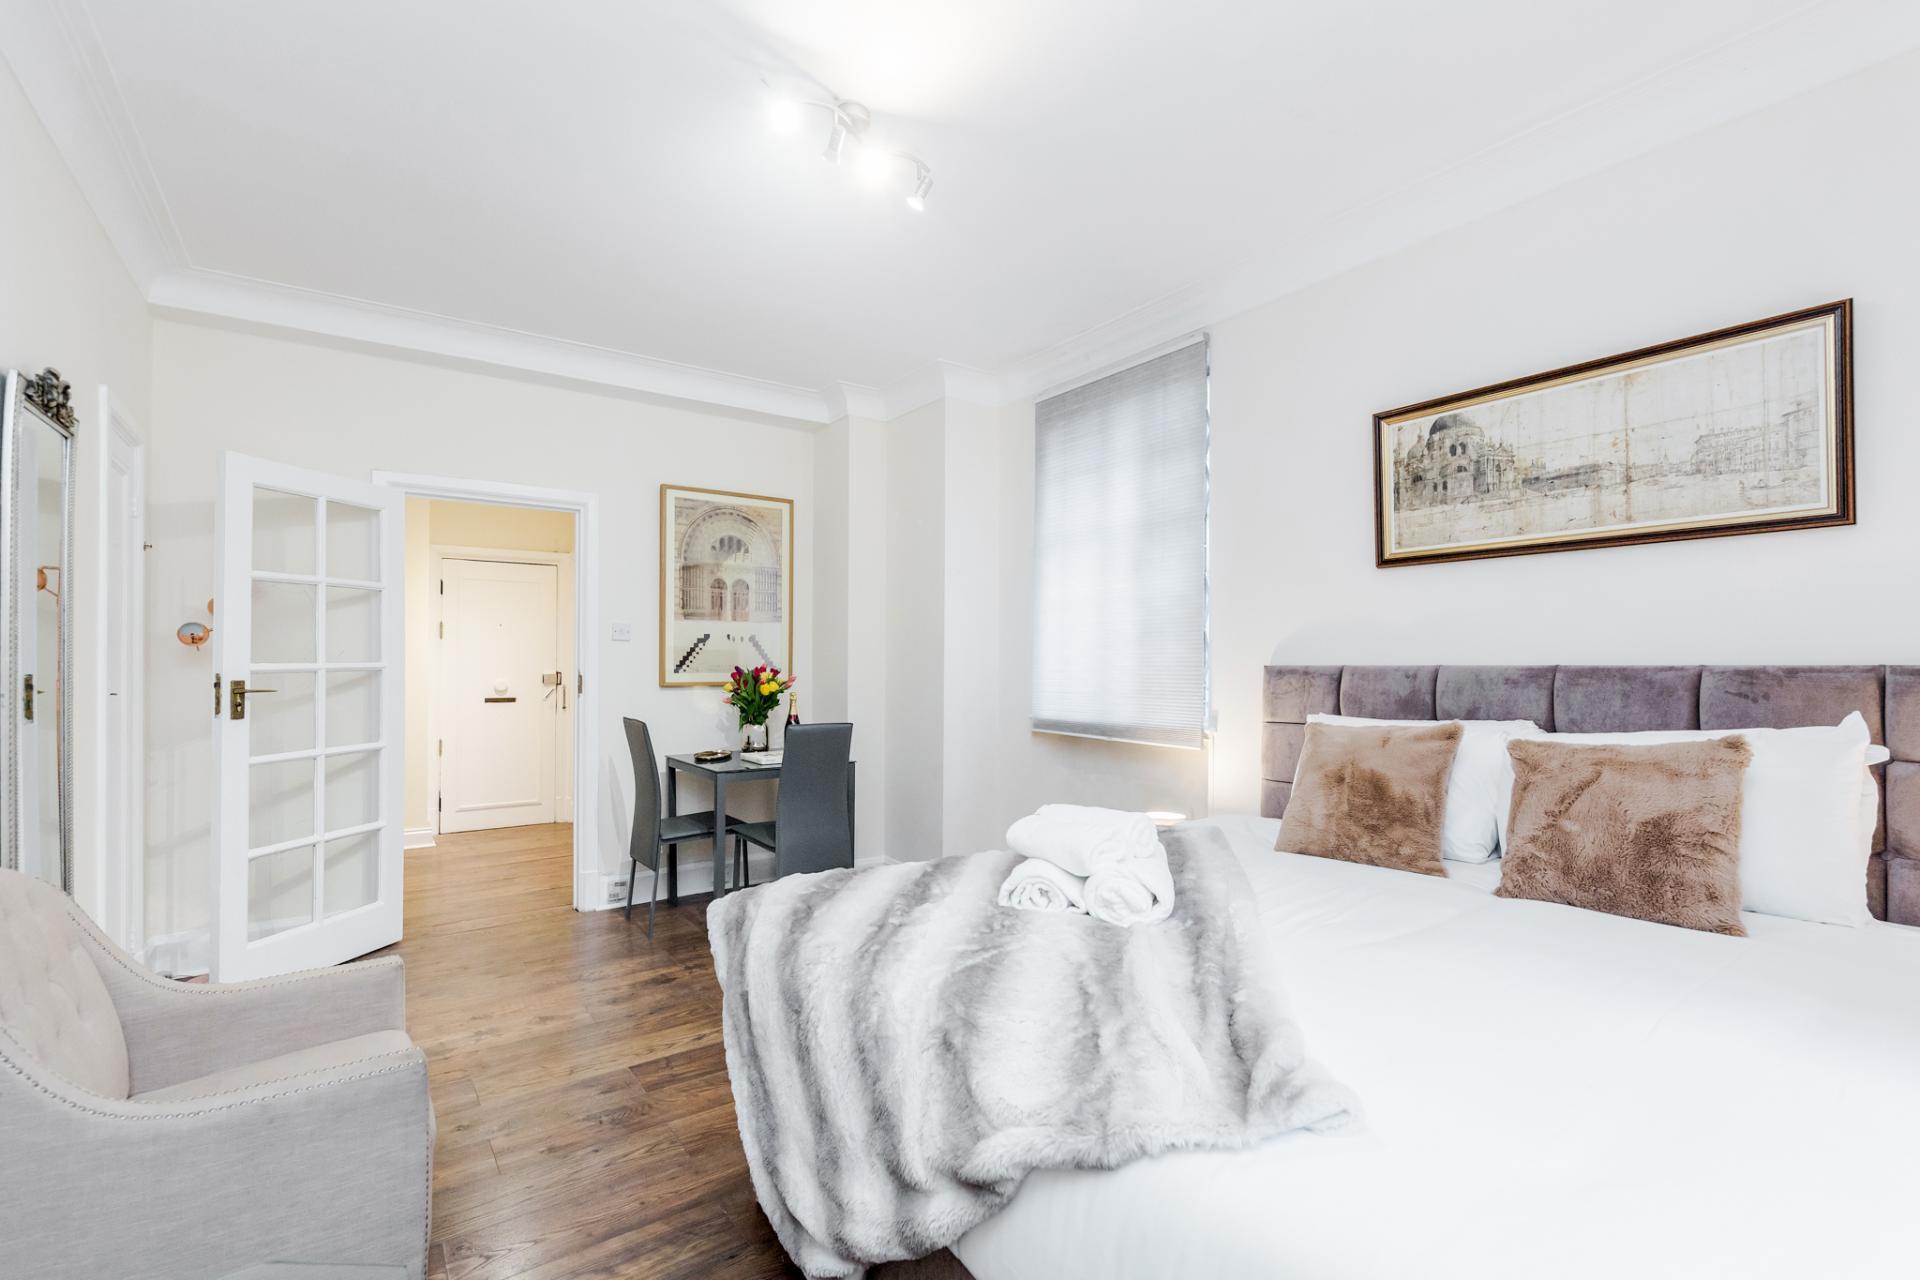 Bedspread at  Marylebone Luxury Apartments, Marylebone, London - Citybase Apartments